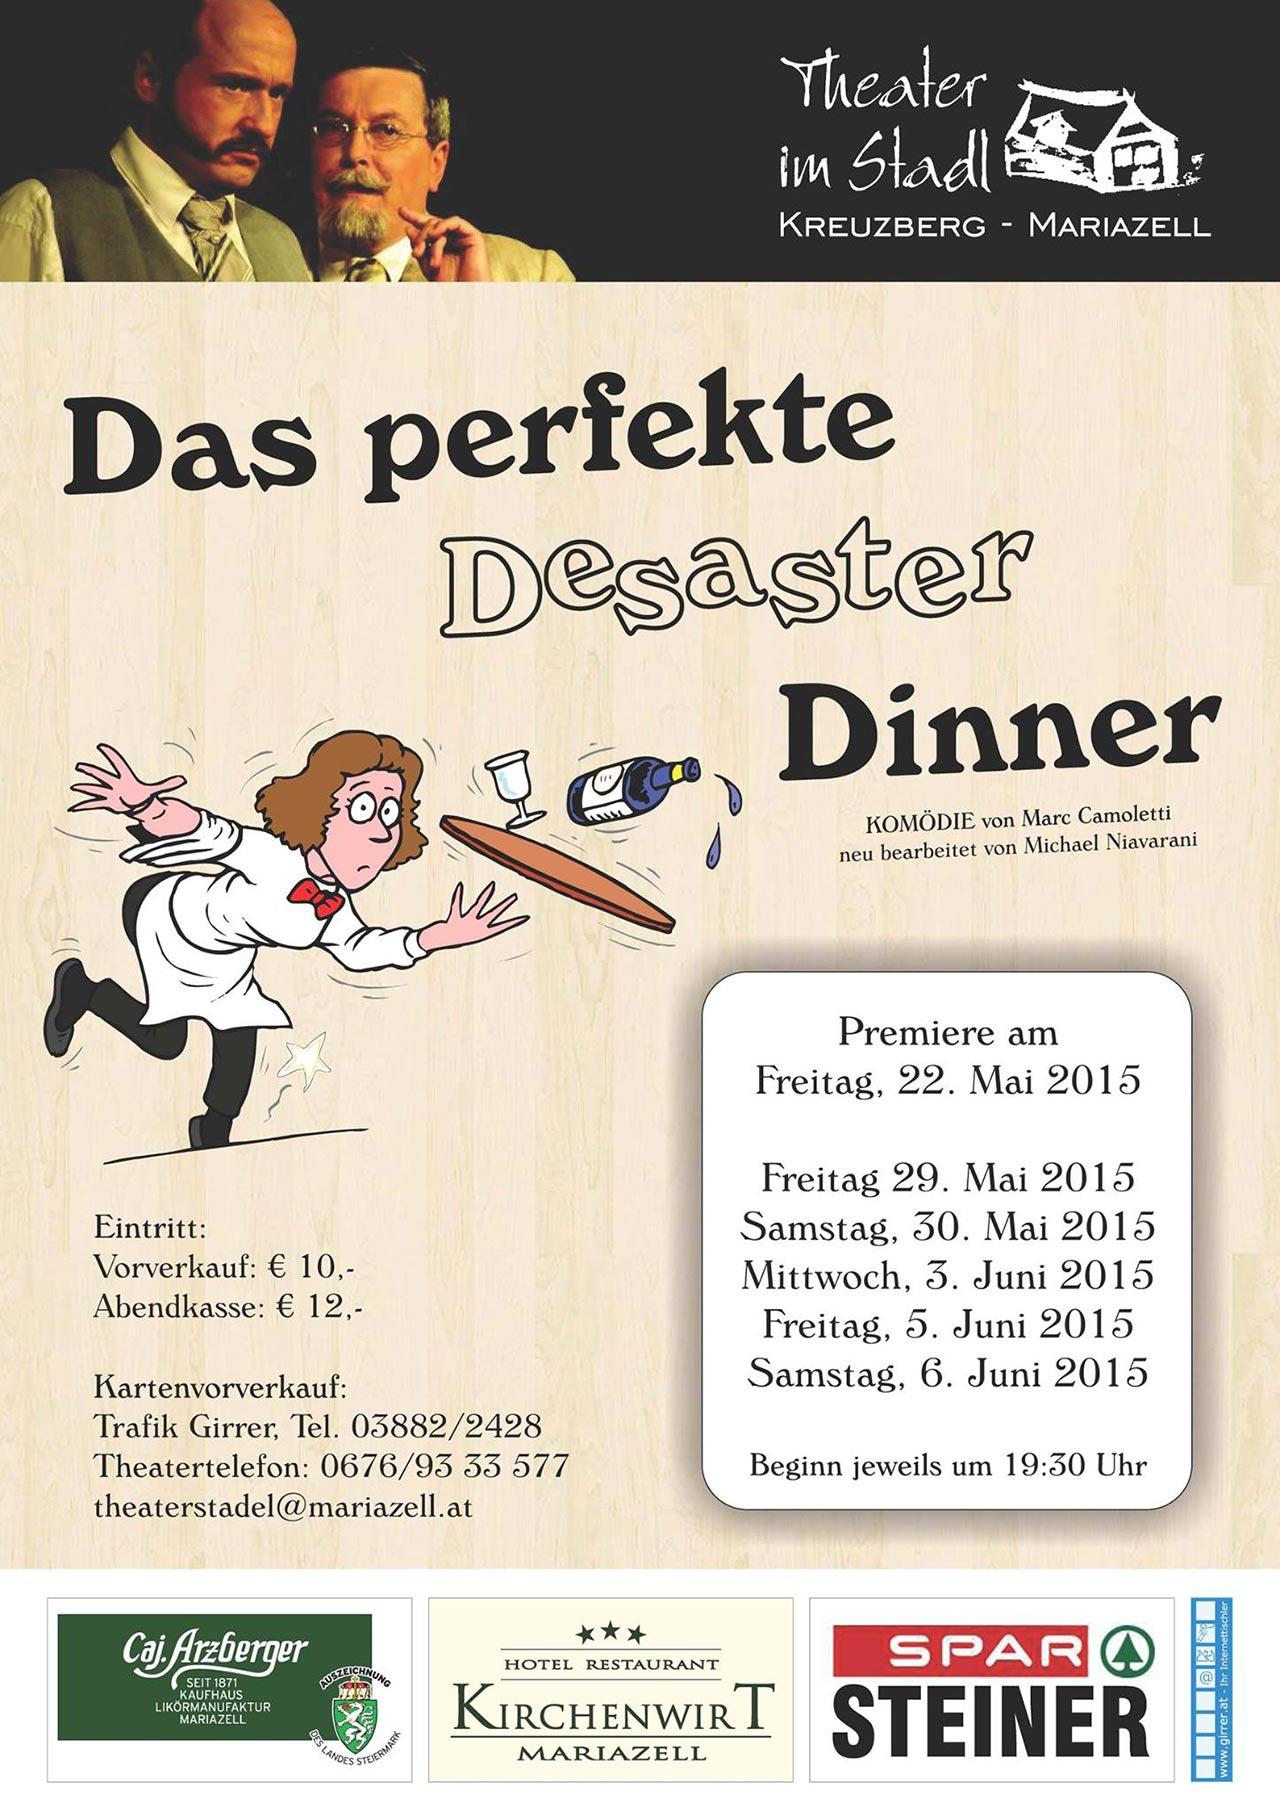 das-perfekte-Desaster-Dinner